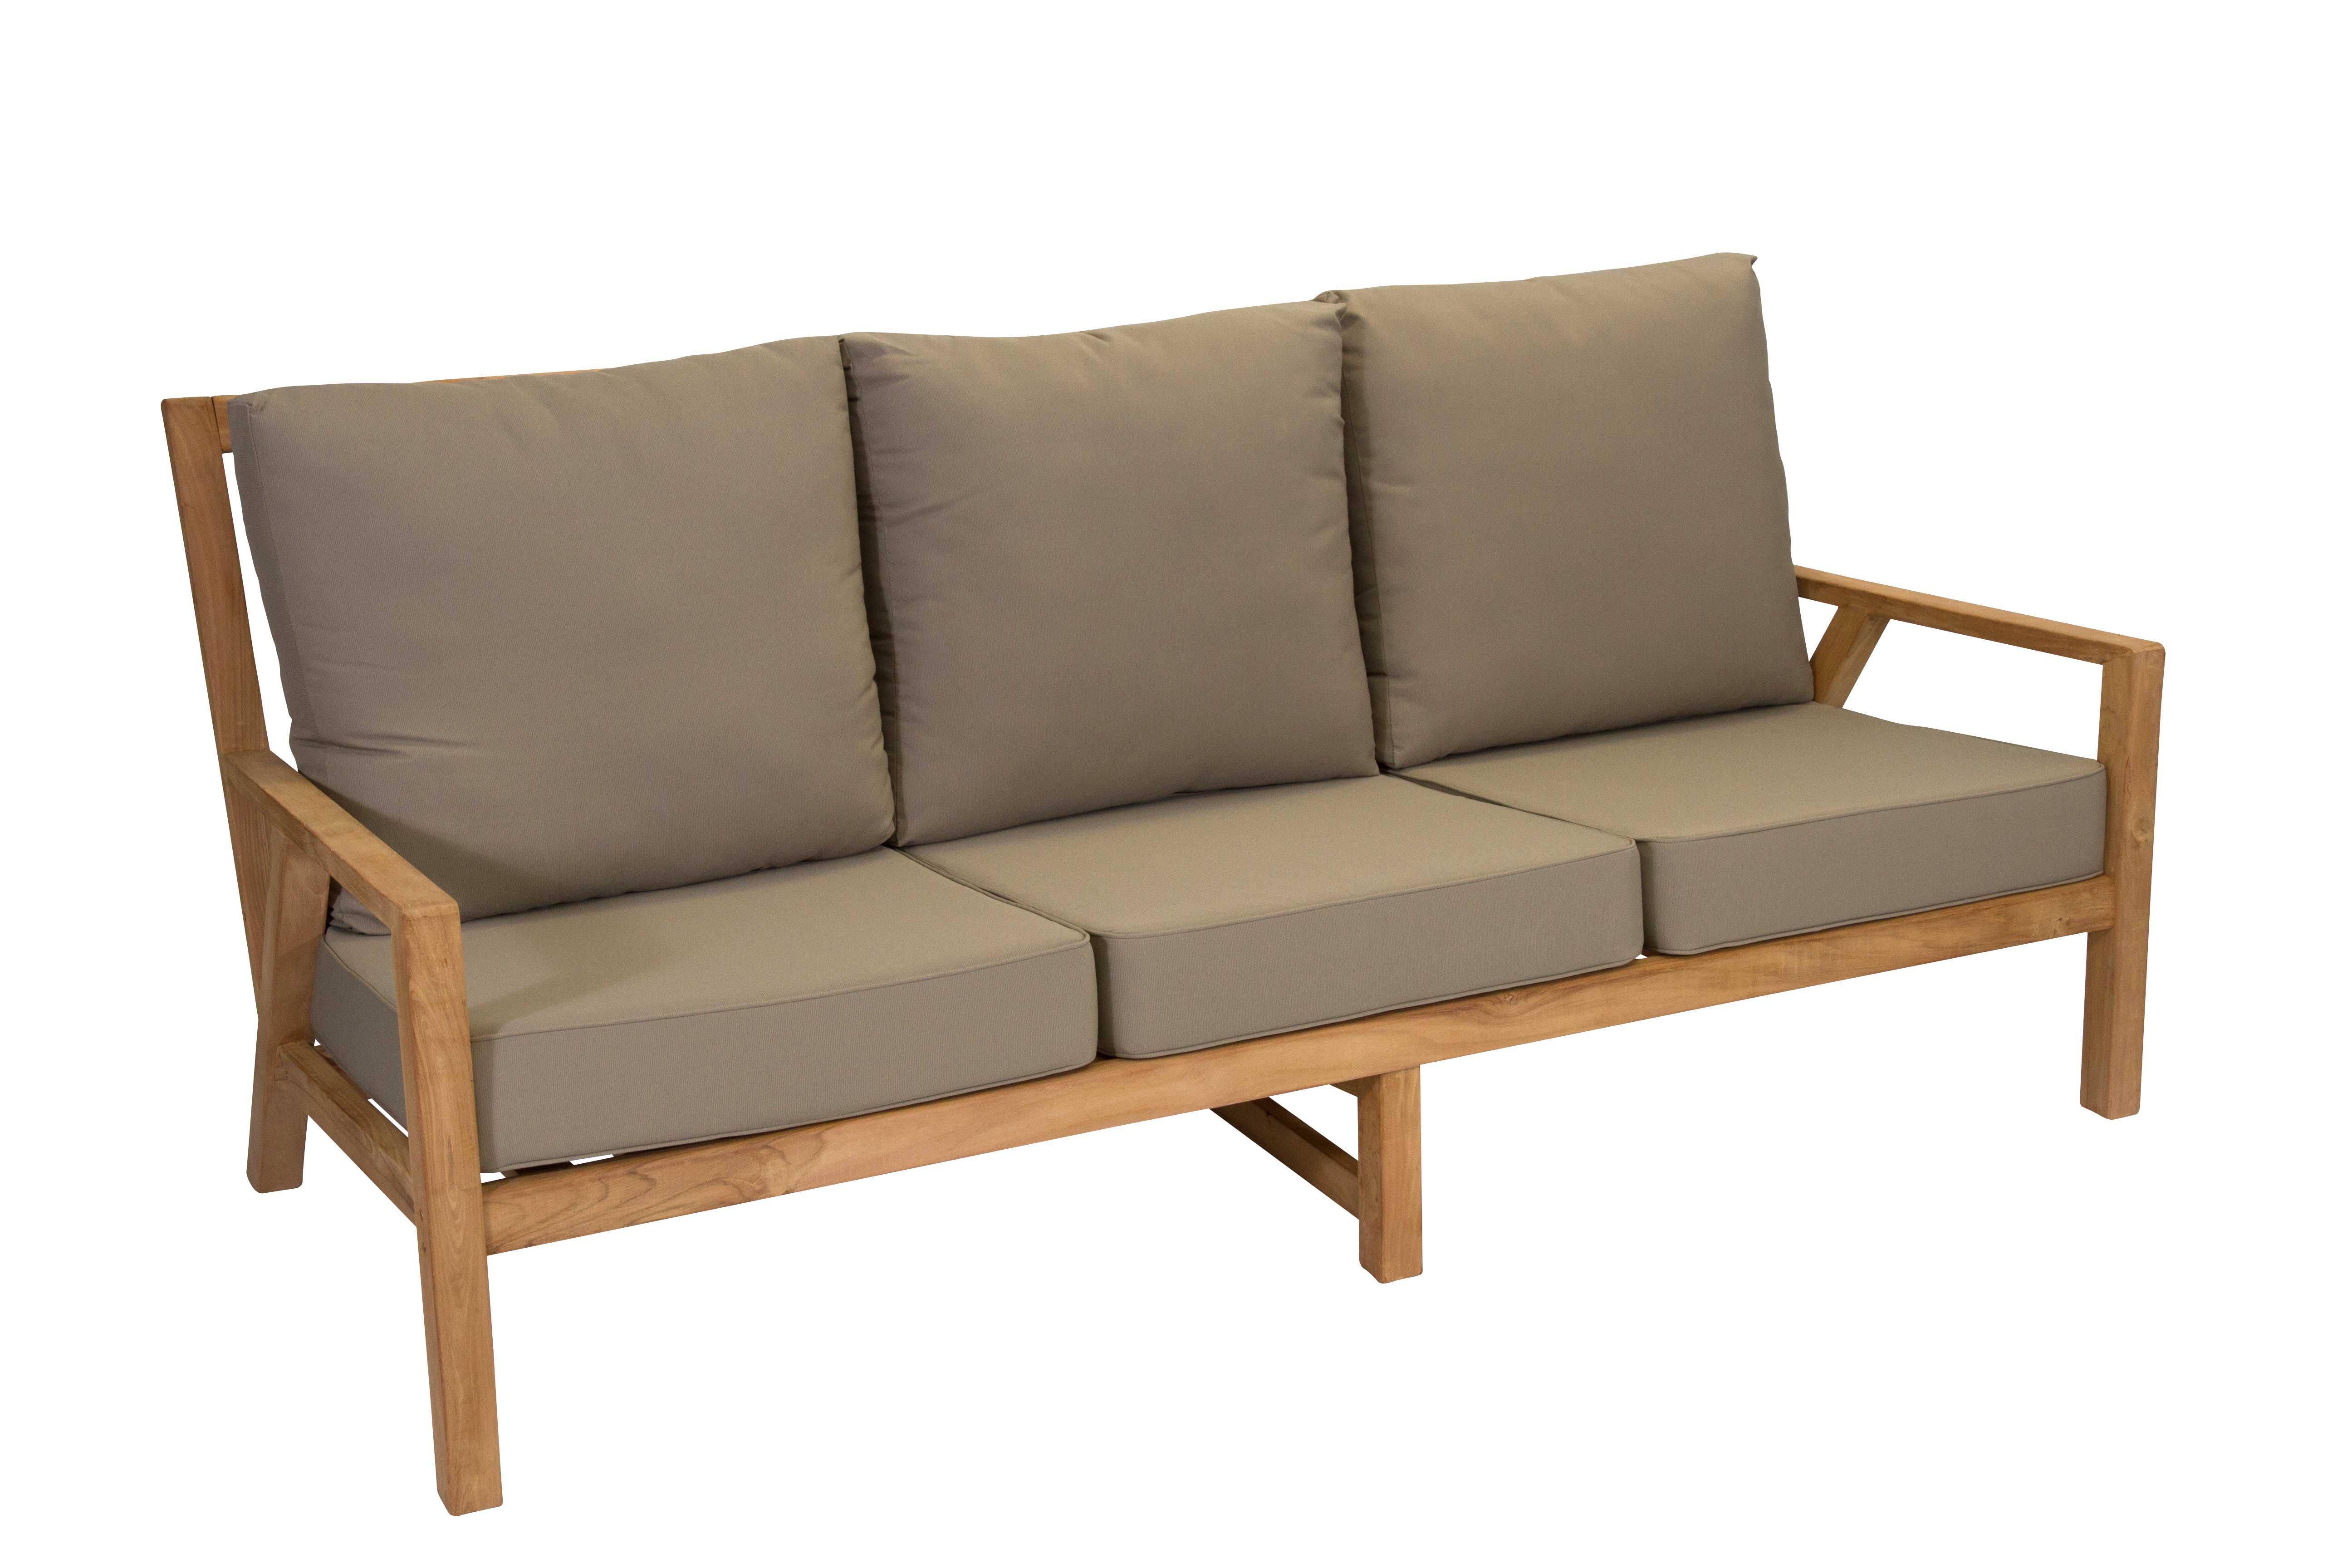 Teak 3 Seater Sofa